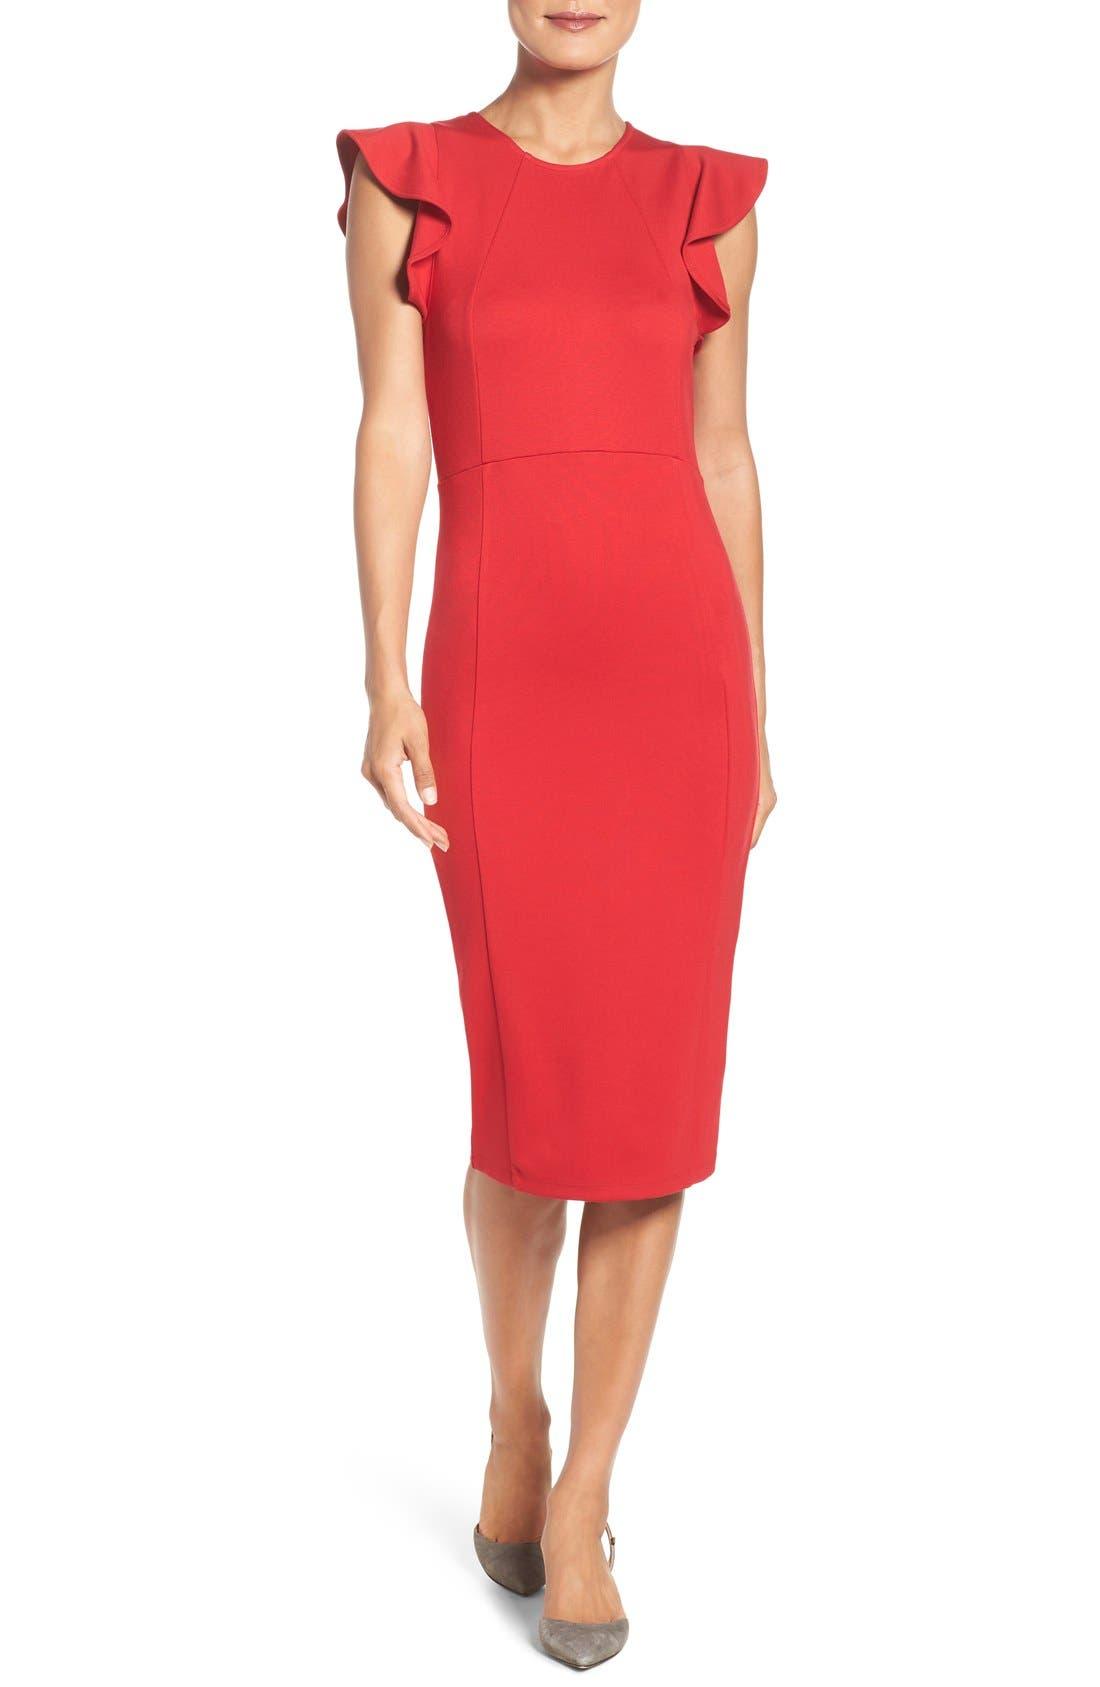 Alternate Image 1 Selected - Felicity & Coco Capriana Ruffle Sheath Dress (Regular & Petite) (Nordstrom Exclusive)